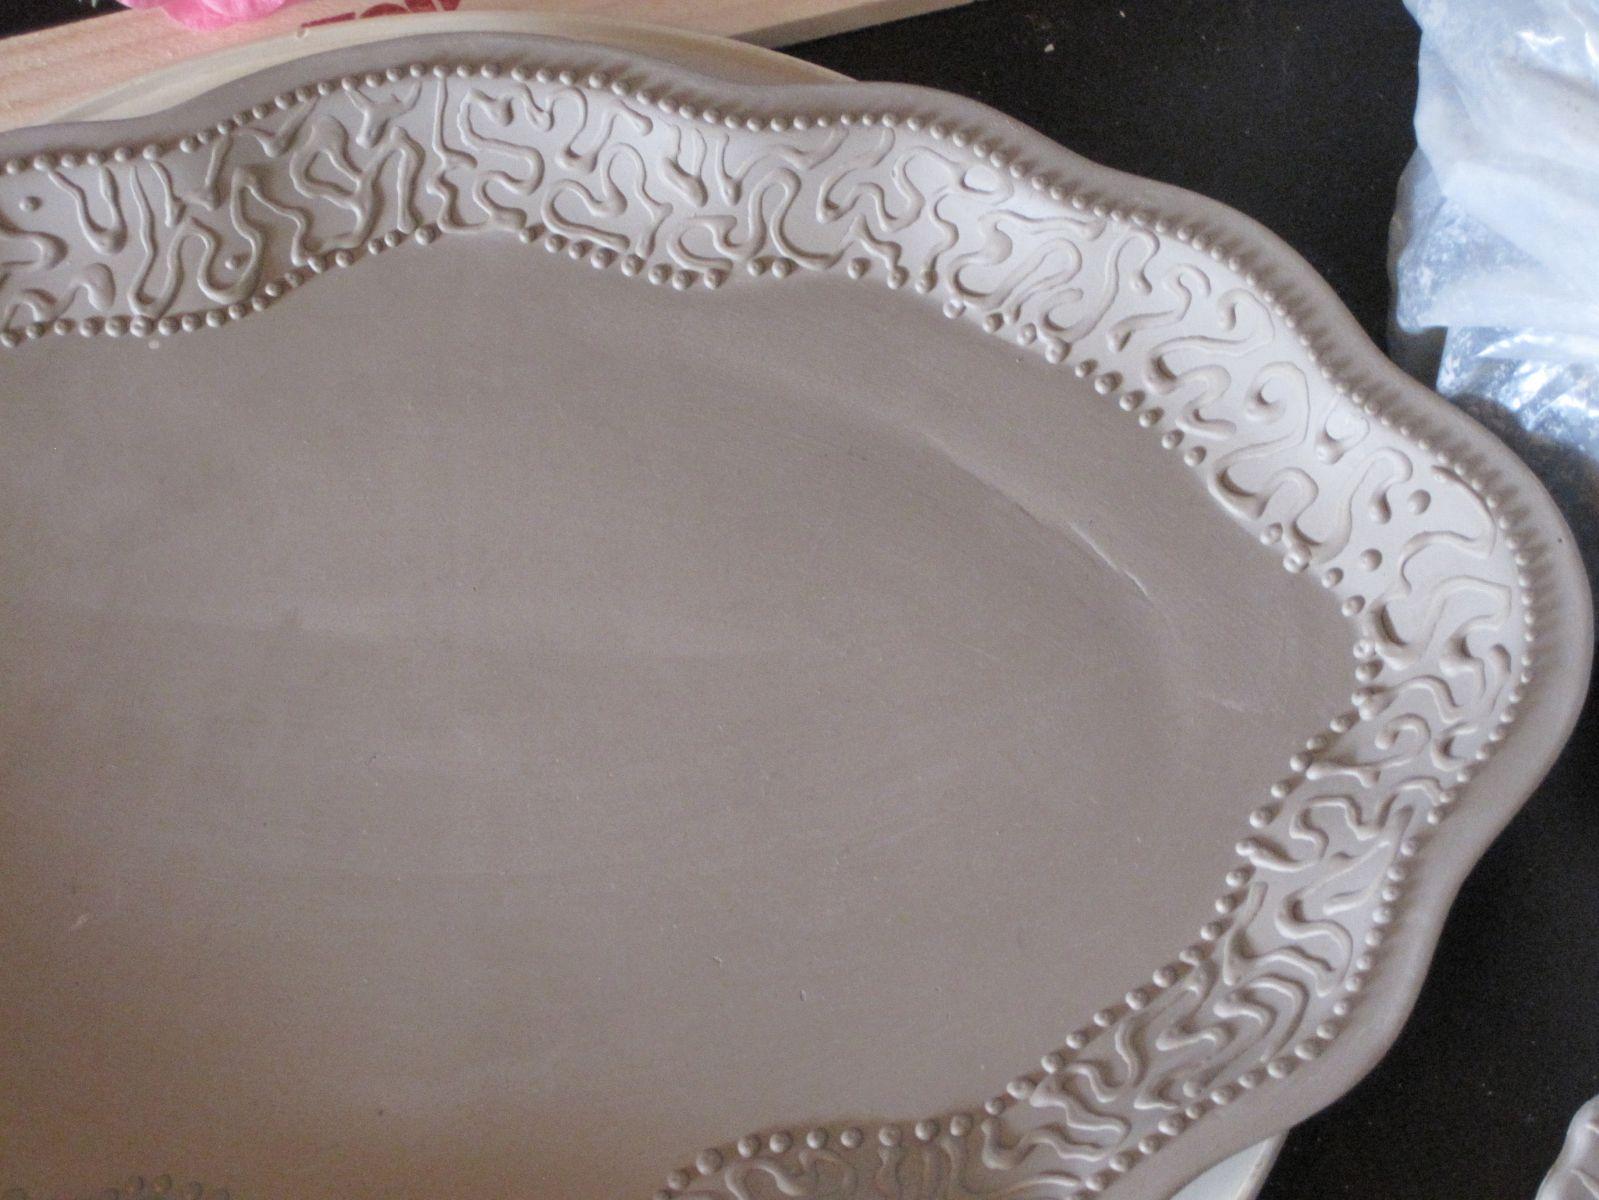 Moroccan platter, slip cast stoneware - Browse Member Galleries